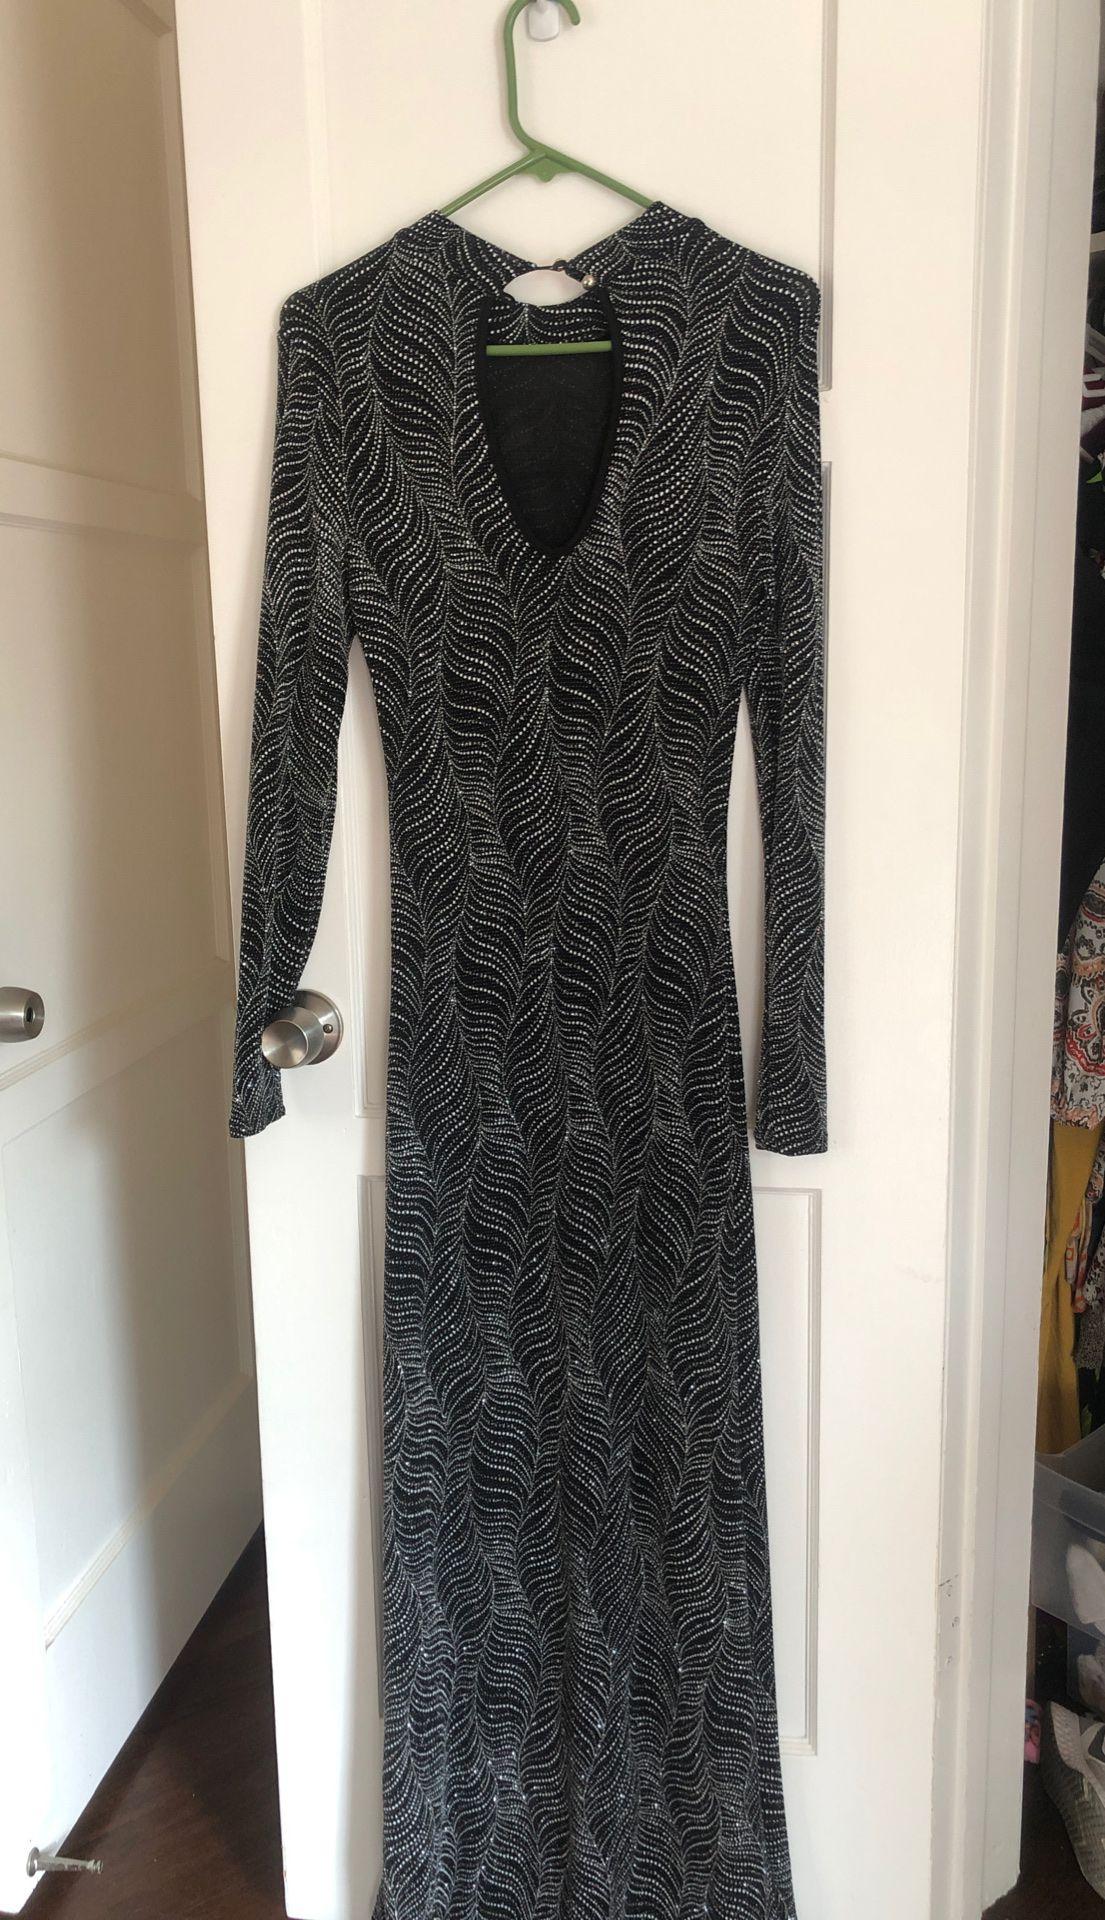 Women's size small glitter dress